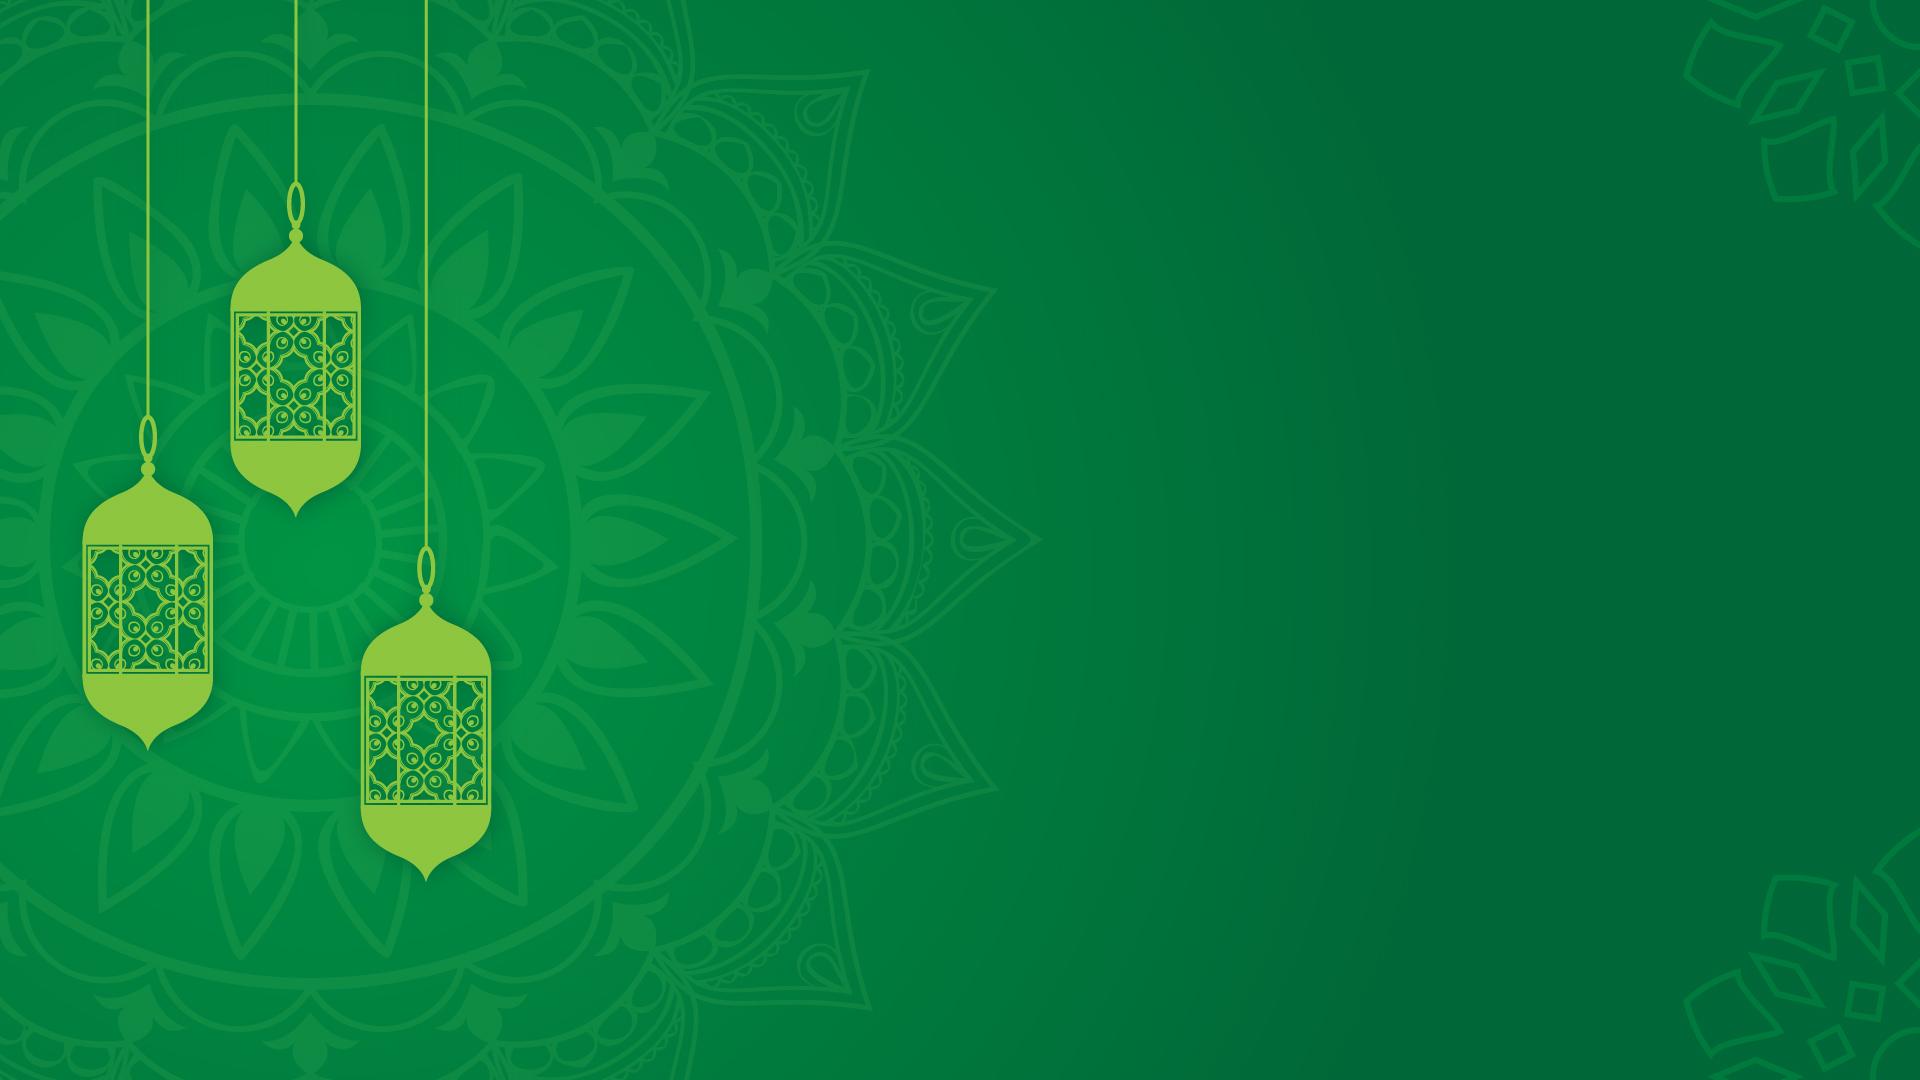 Background Idul Fitri Hijau Yang Indah 1080p - Mas Vian